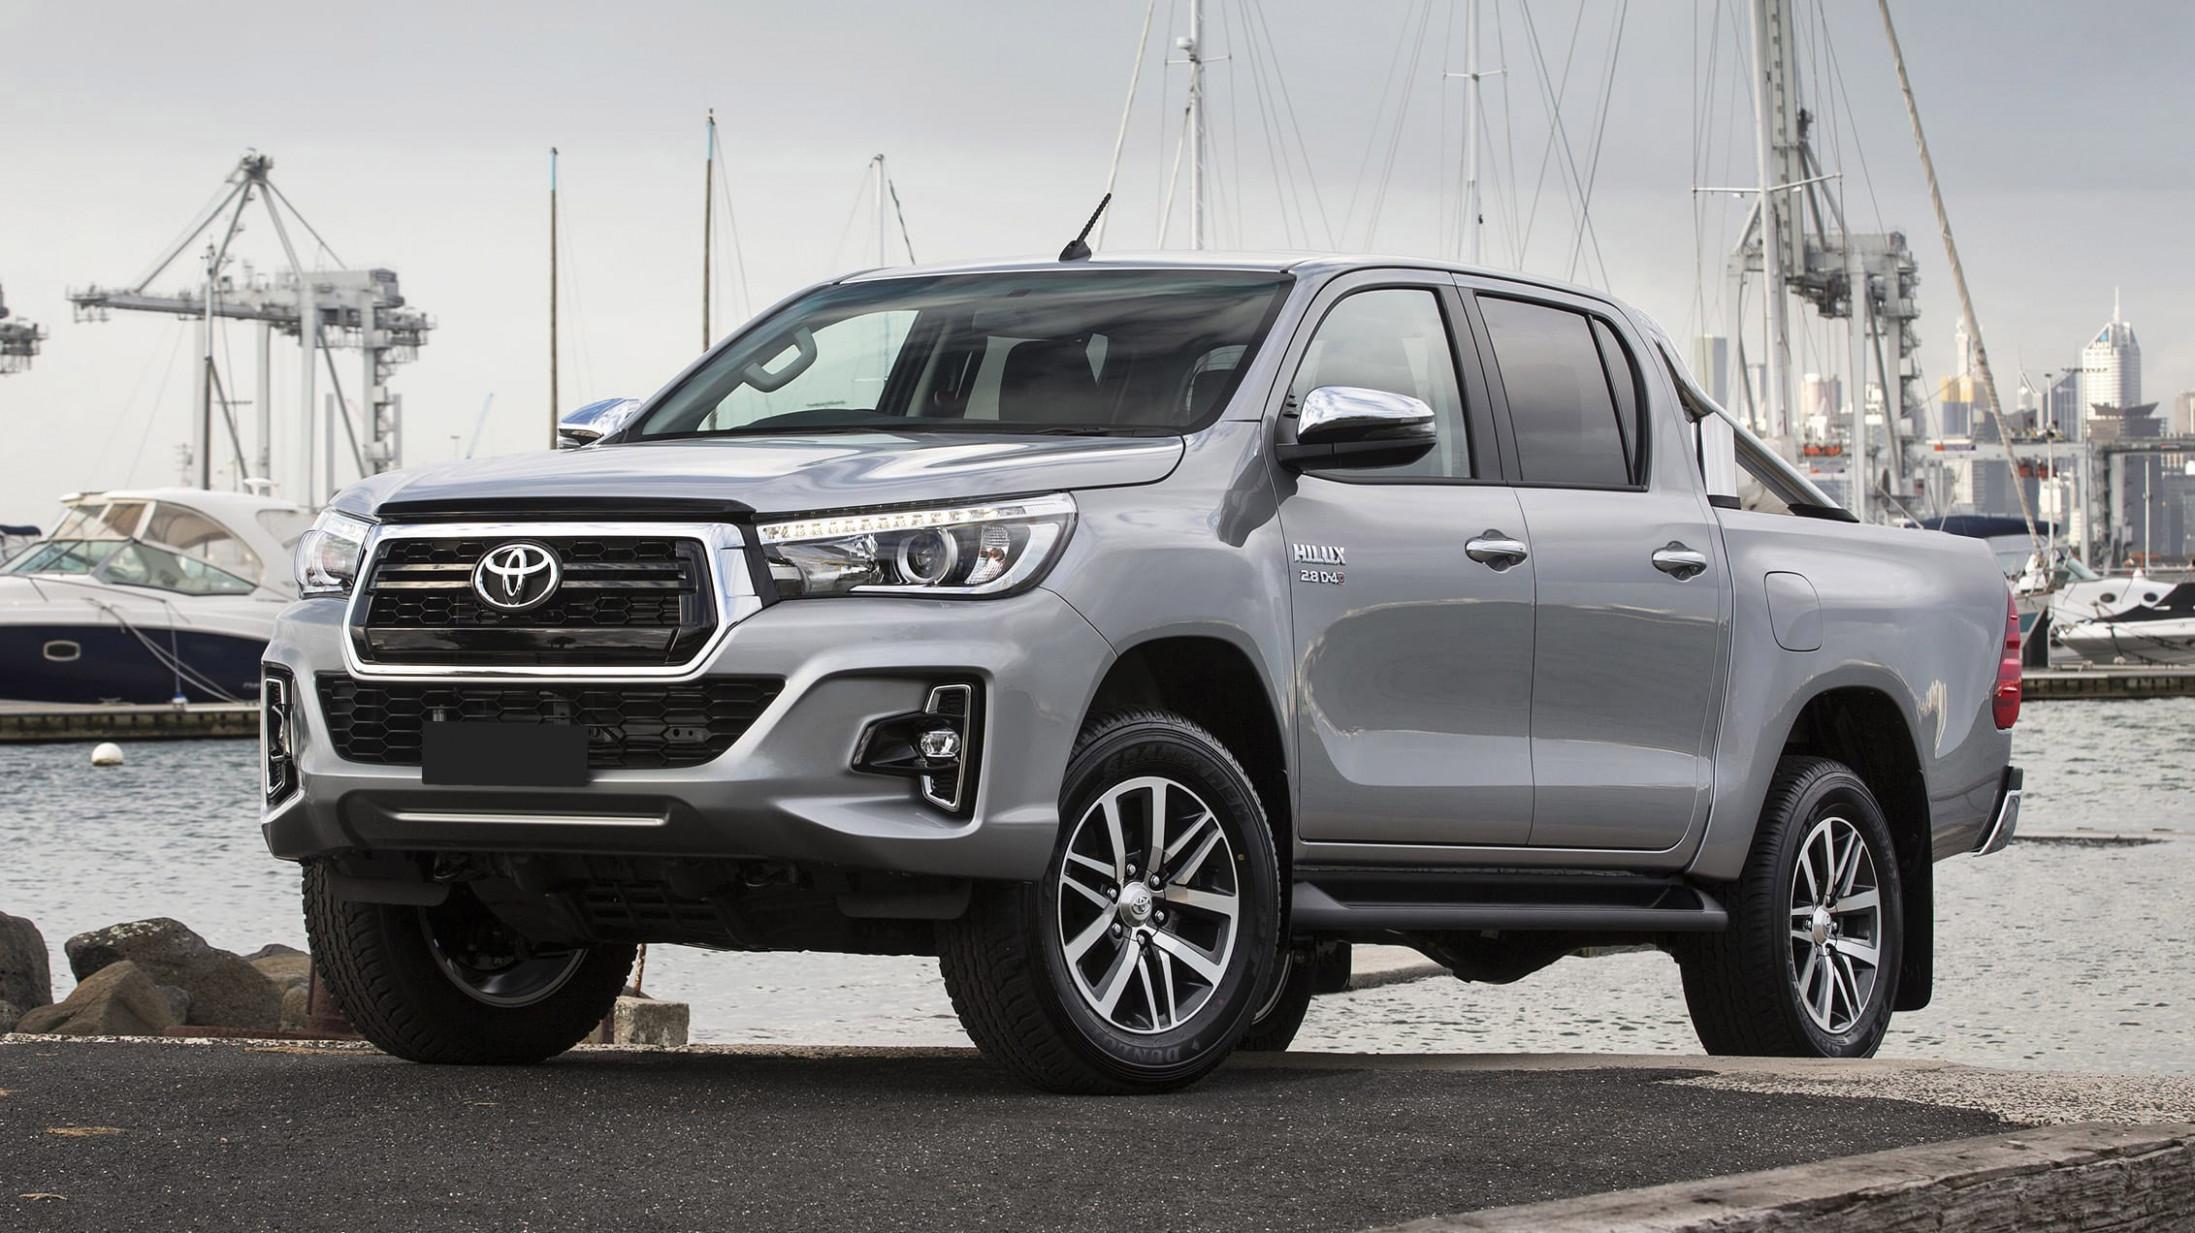 Ratings 2022 Toyota Hilux Spy Shots